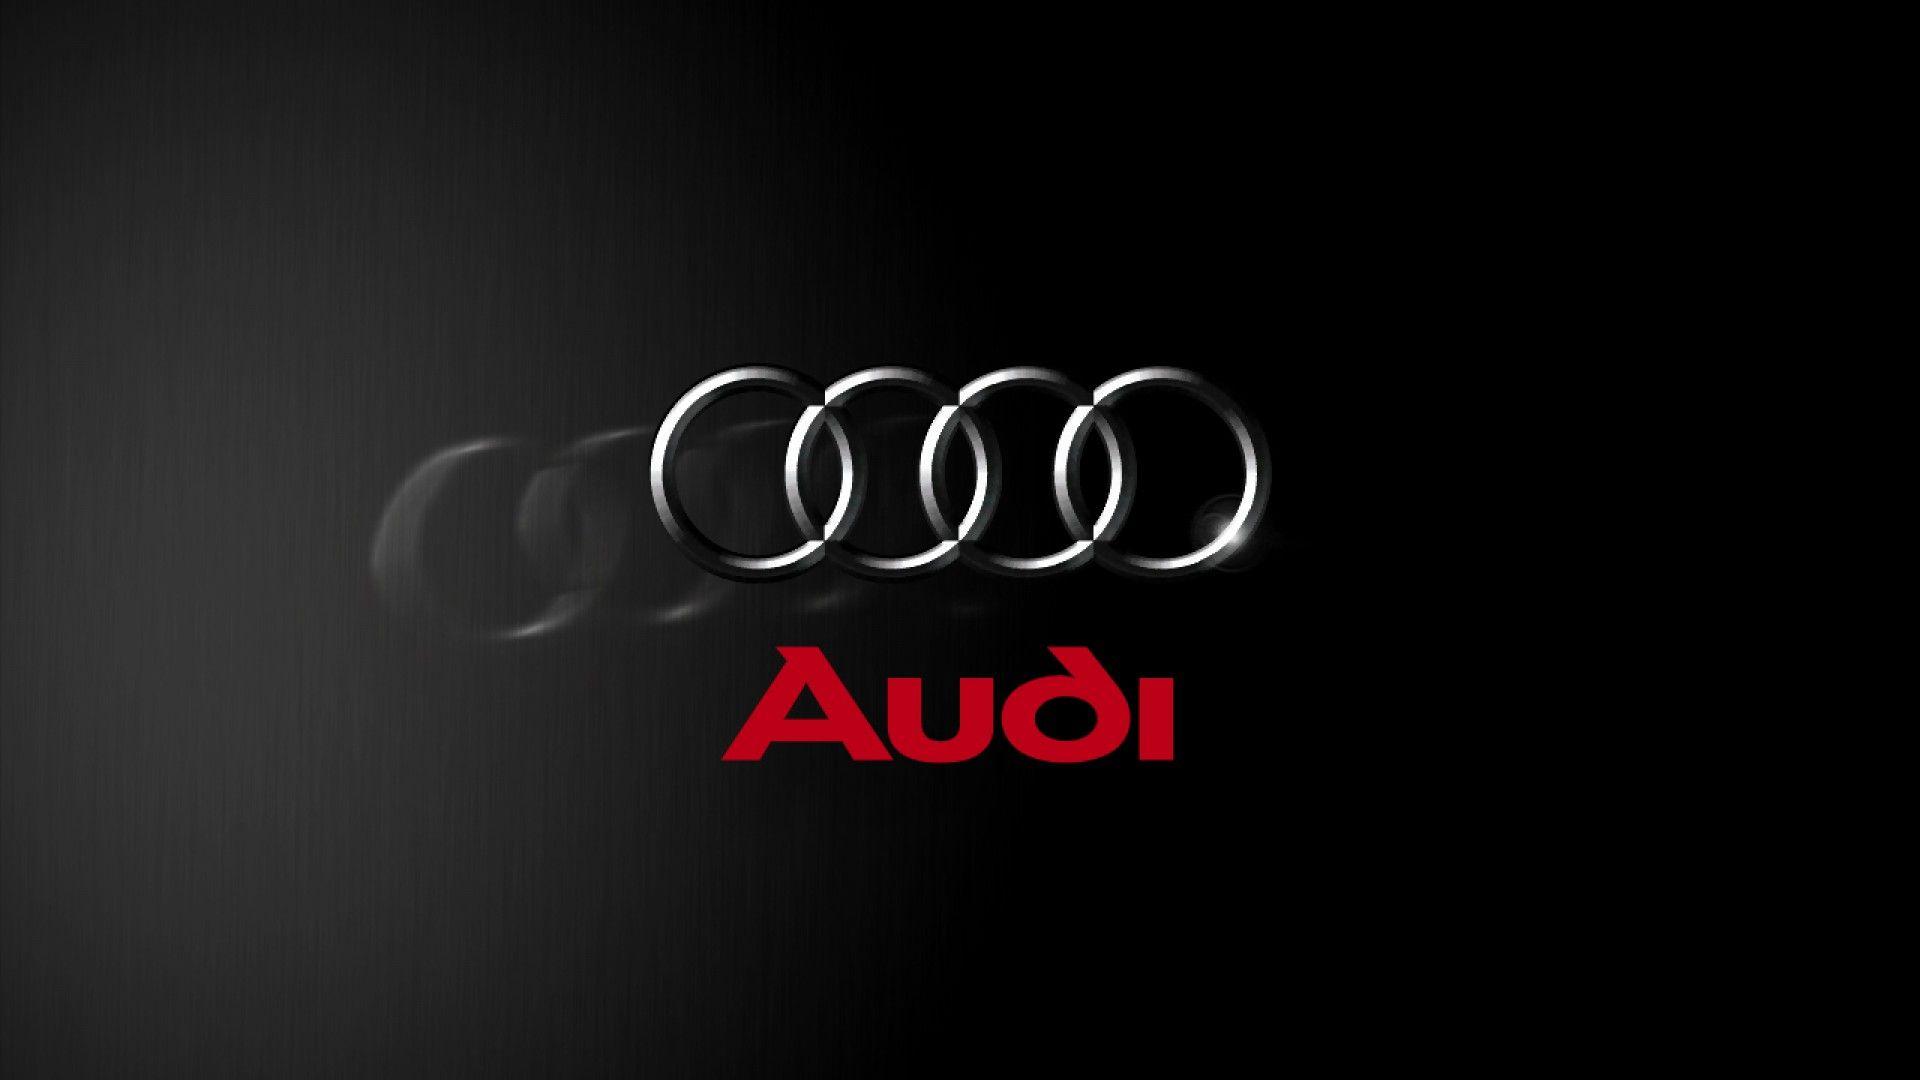 Audi Logo Hd Wallpaper For Iphone